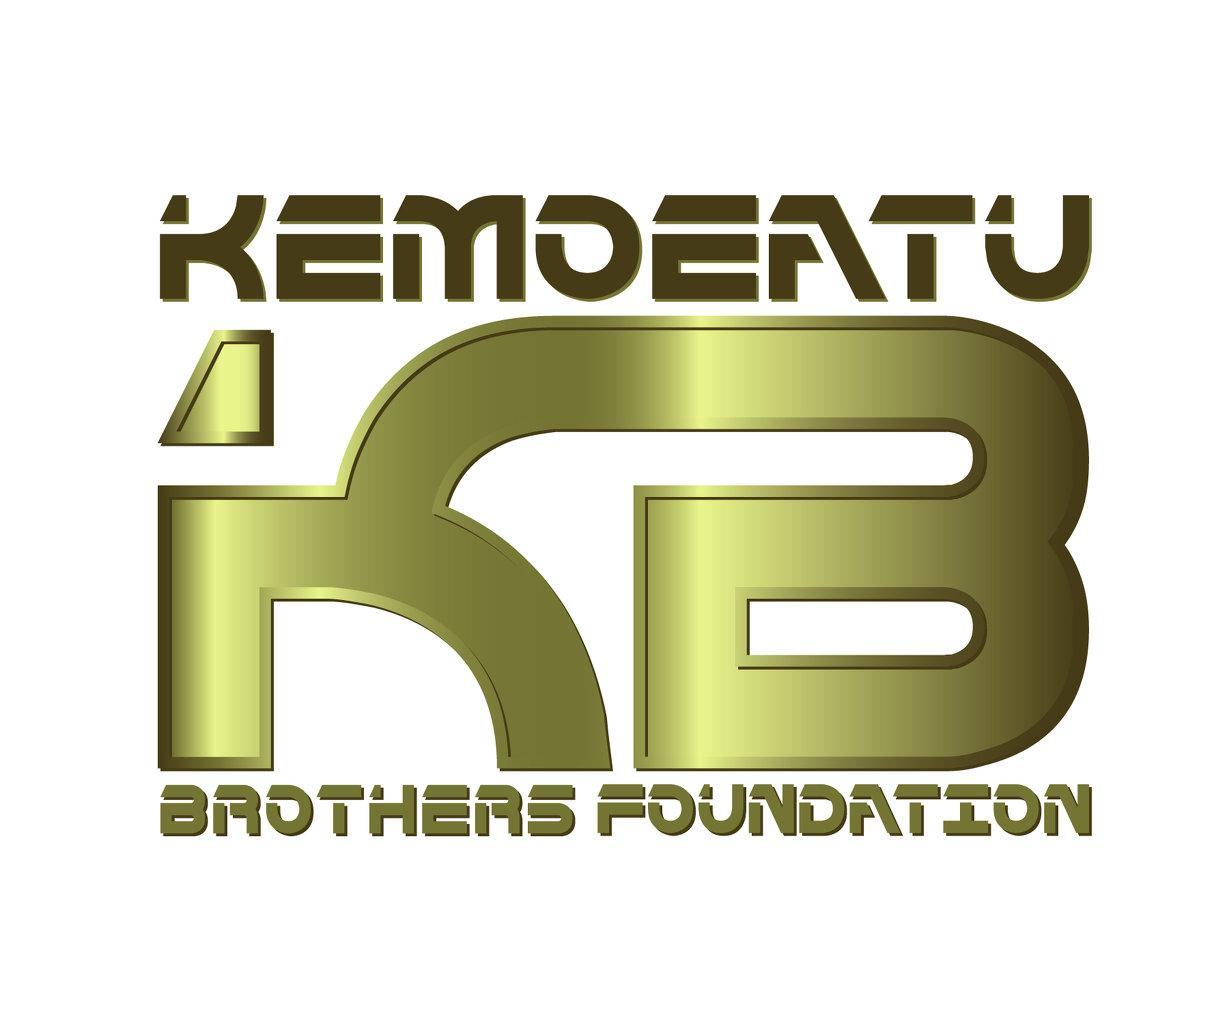 Kemoeatu Foundation